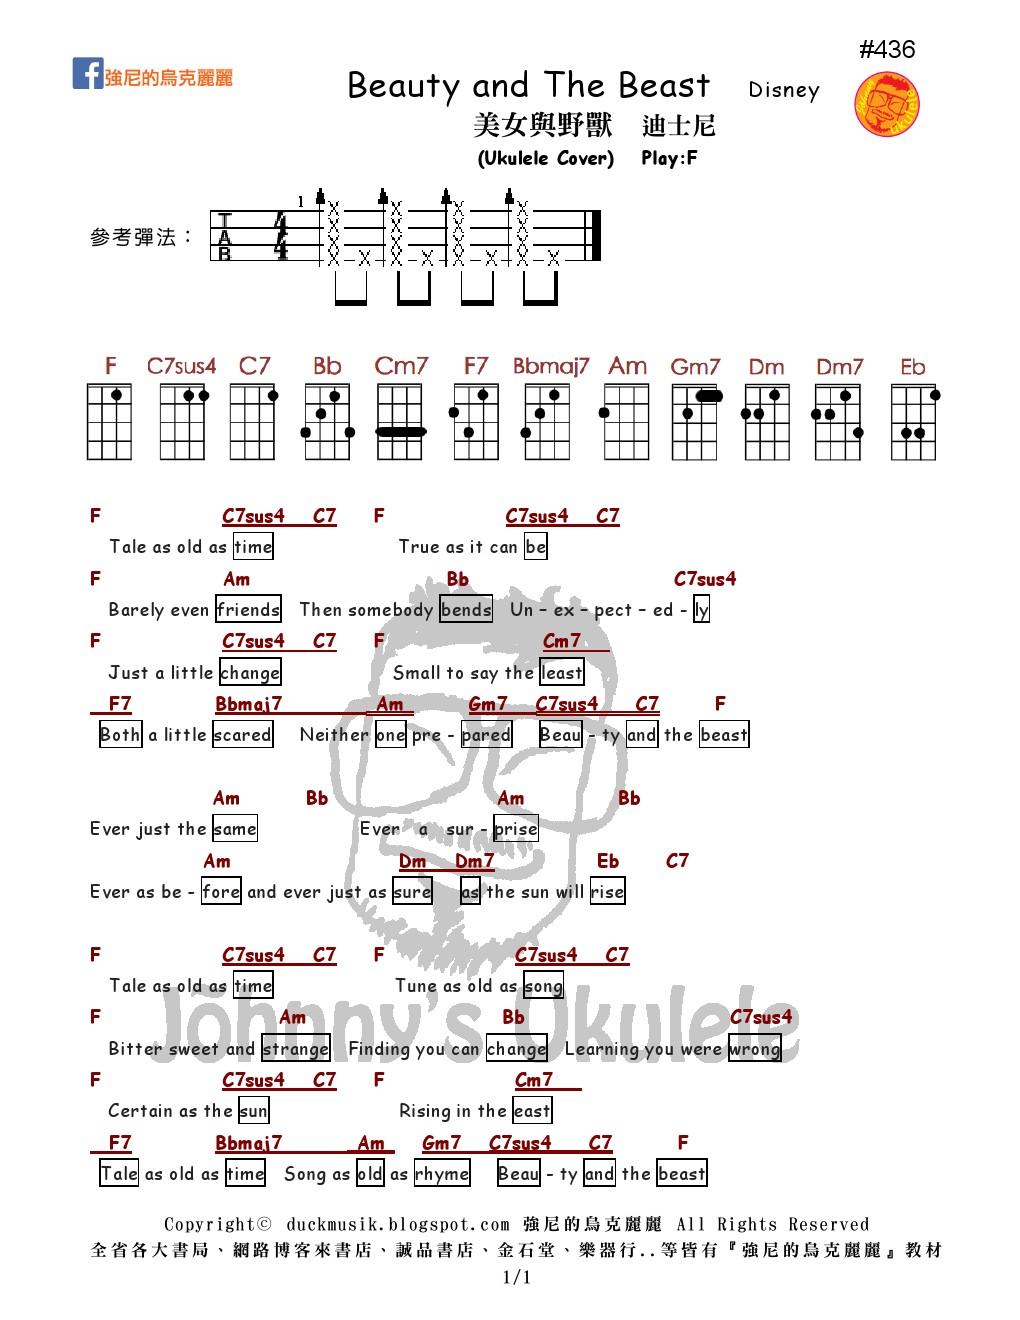 Johnny ukulele 436 beauty and the beast 436 beauty and the beast disney johnnys ukulele tabs hexwebz Choice Image